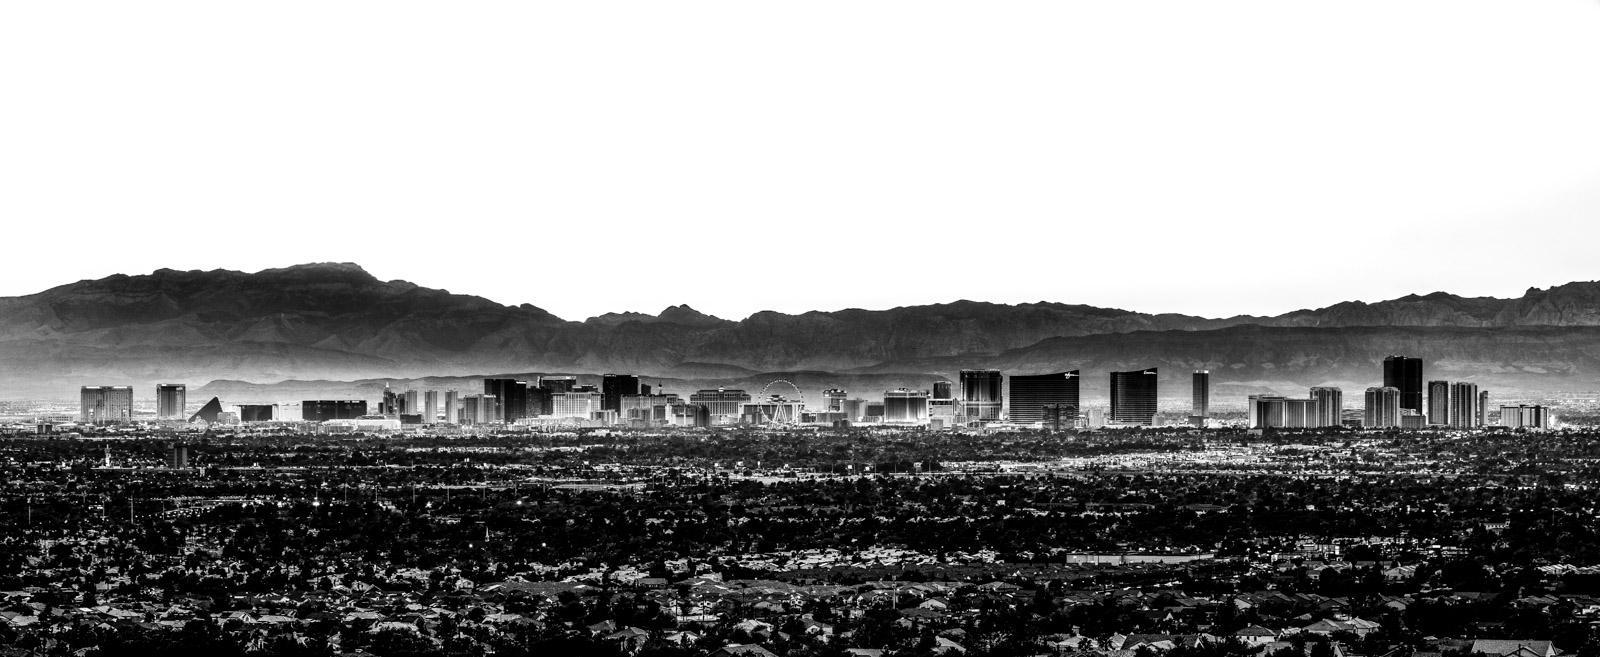 Xxx Las Vegas Blog Bilder